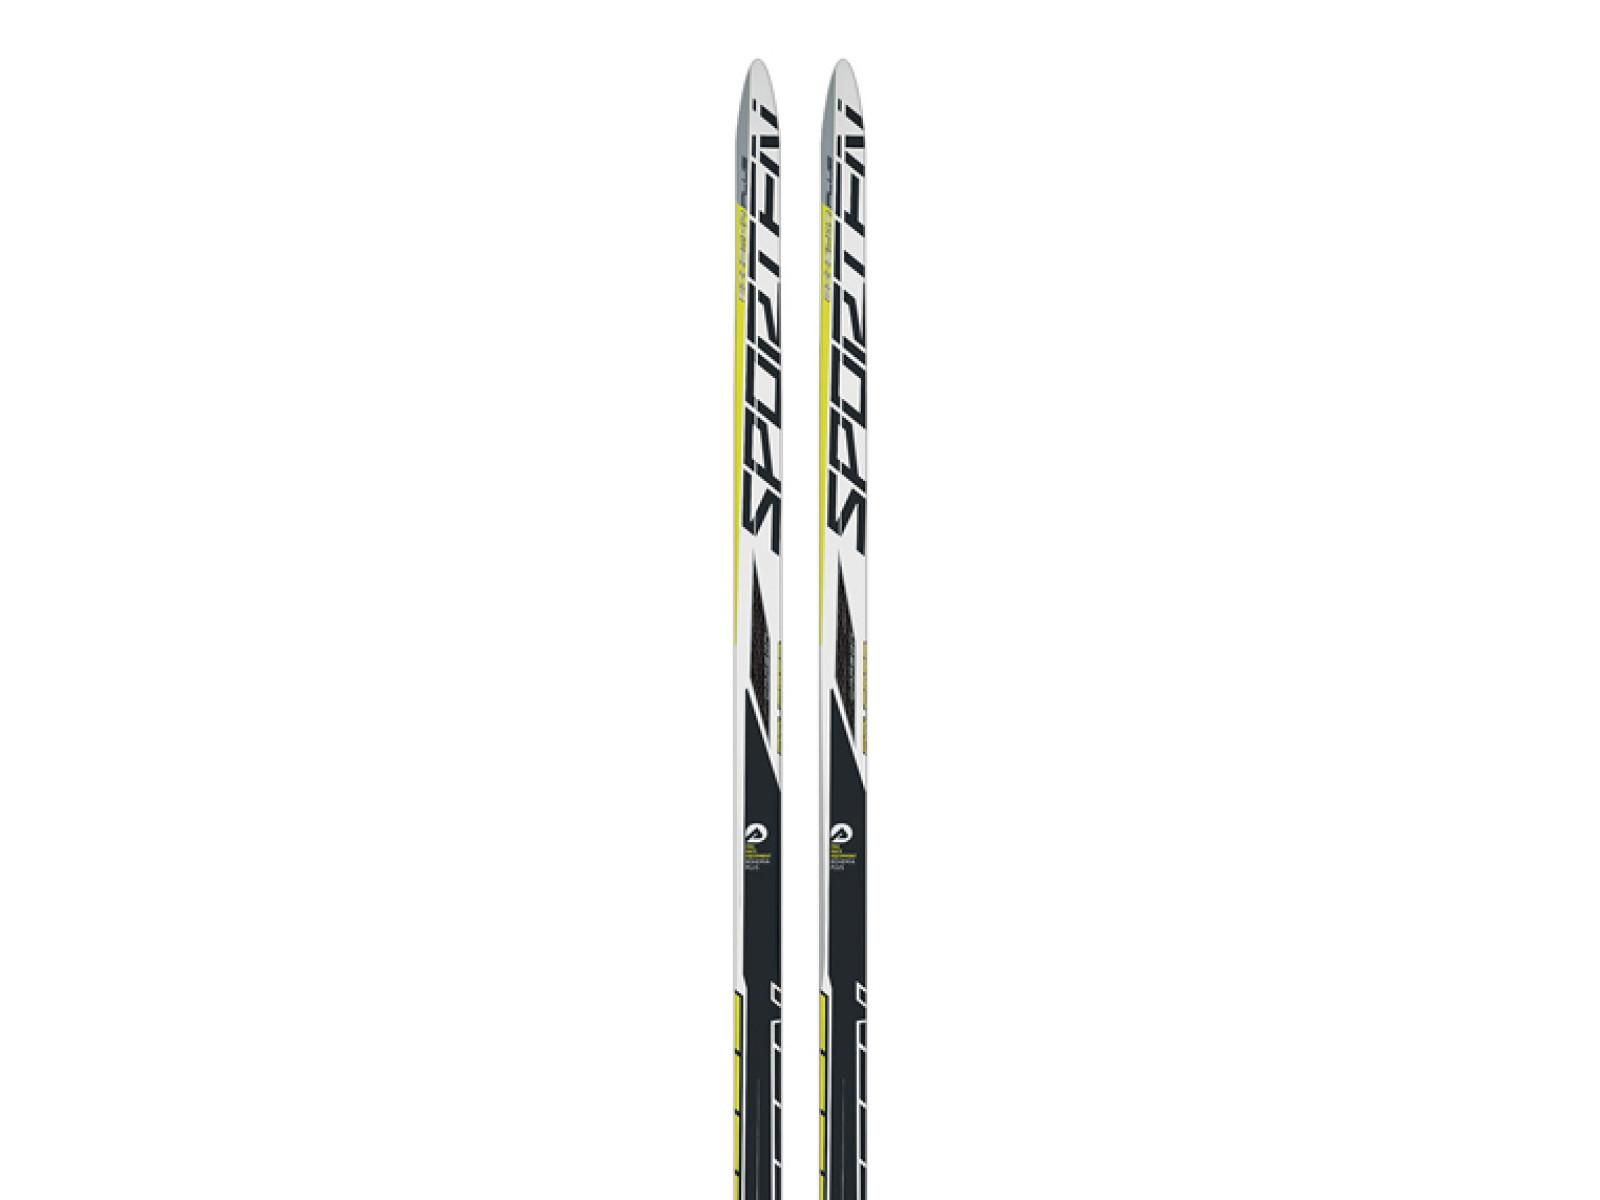 Sporten Bohemia Plus Classic - Medium Délka: 180 cm 2014/2015